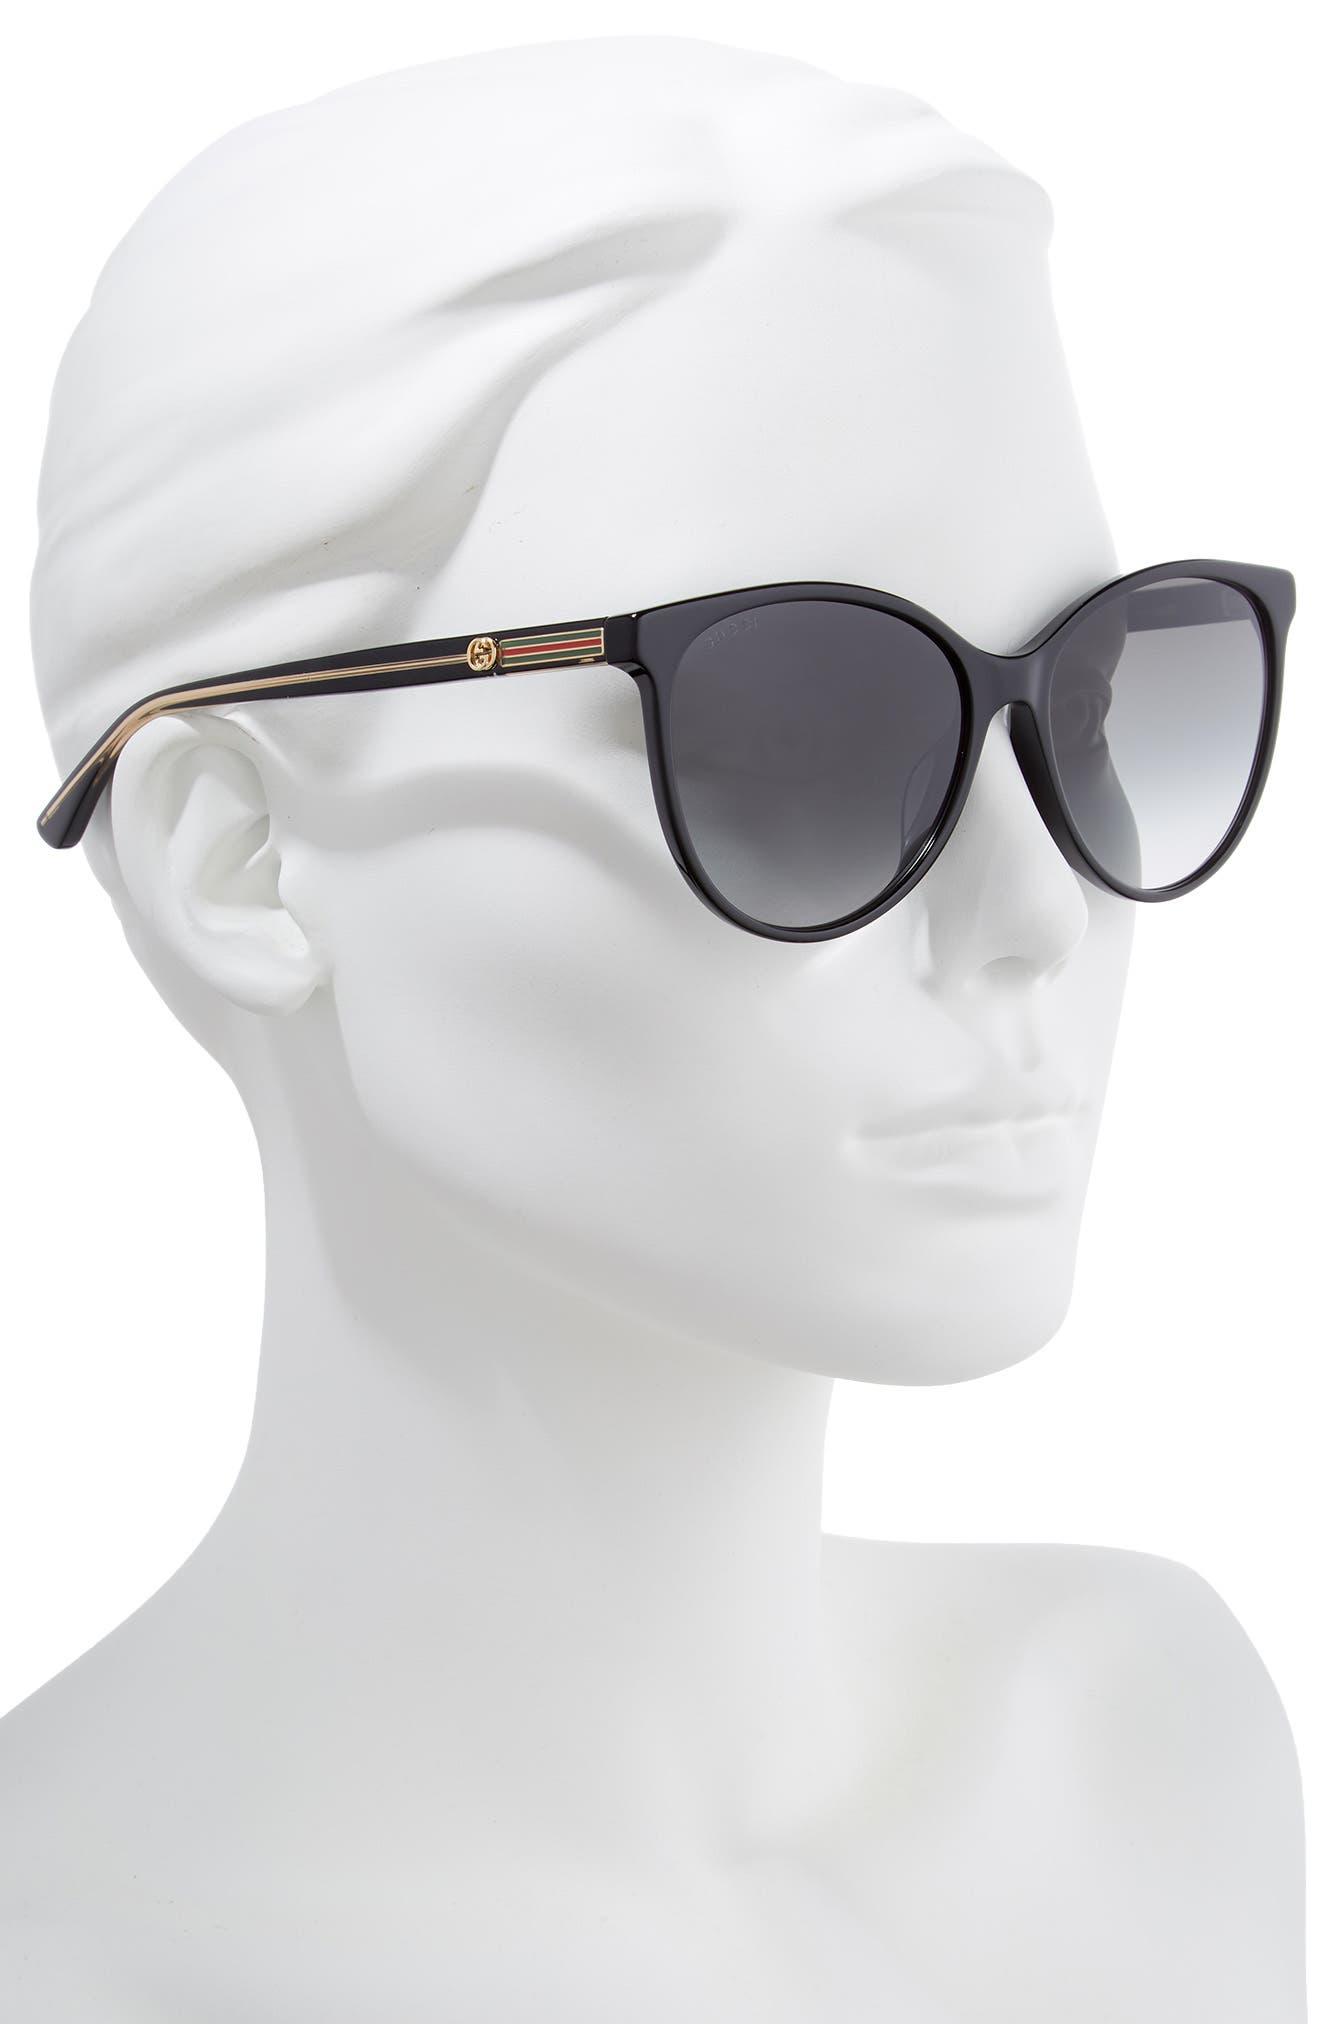 GUCCI,                             57mm Cat Eye Sunglasses,                             Alternate thumbnail 2, color,                             BLACK/ CRYSTAL/ GREY GRADIENT